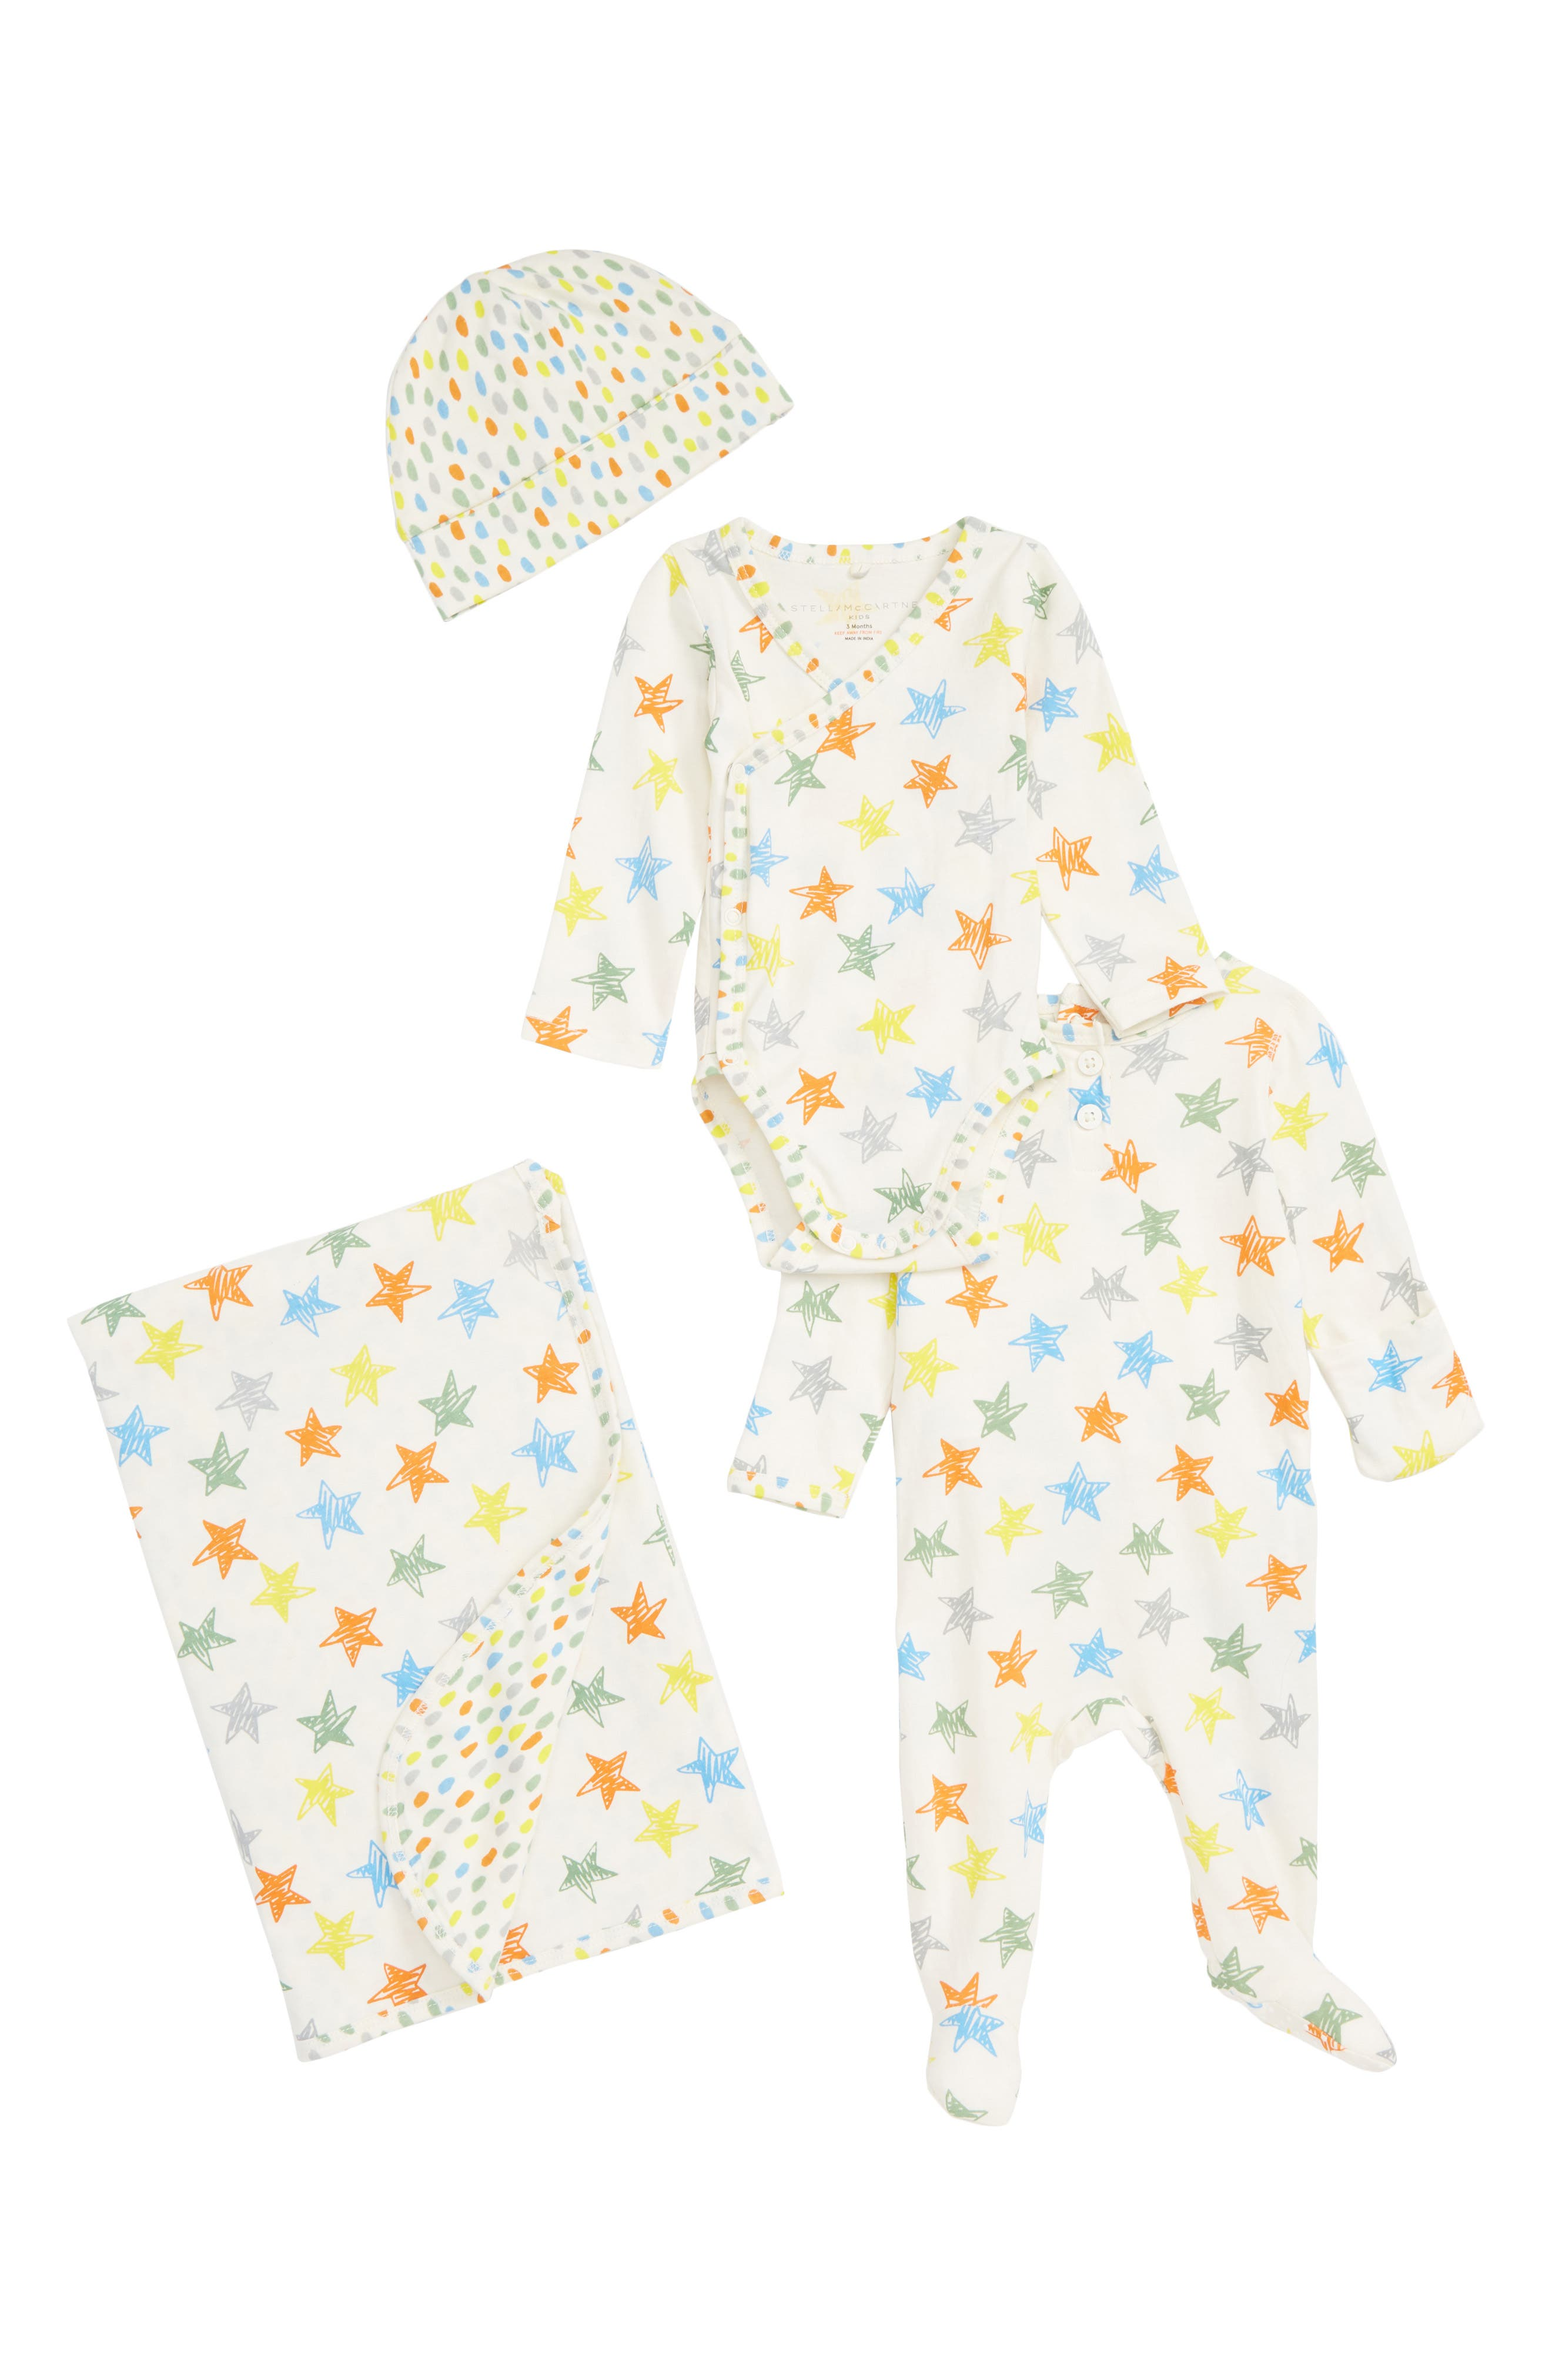 STELLA MCCARTNEY KIDS Stella McCartney Organic Cotton Hat, Wrap Bodysuit, Romper & Blanket Set, Main, color, MULTI